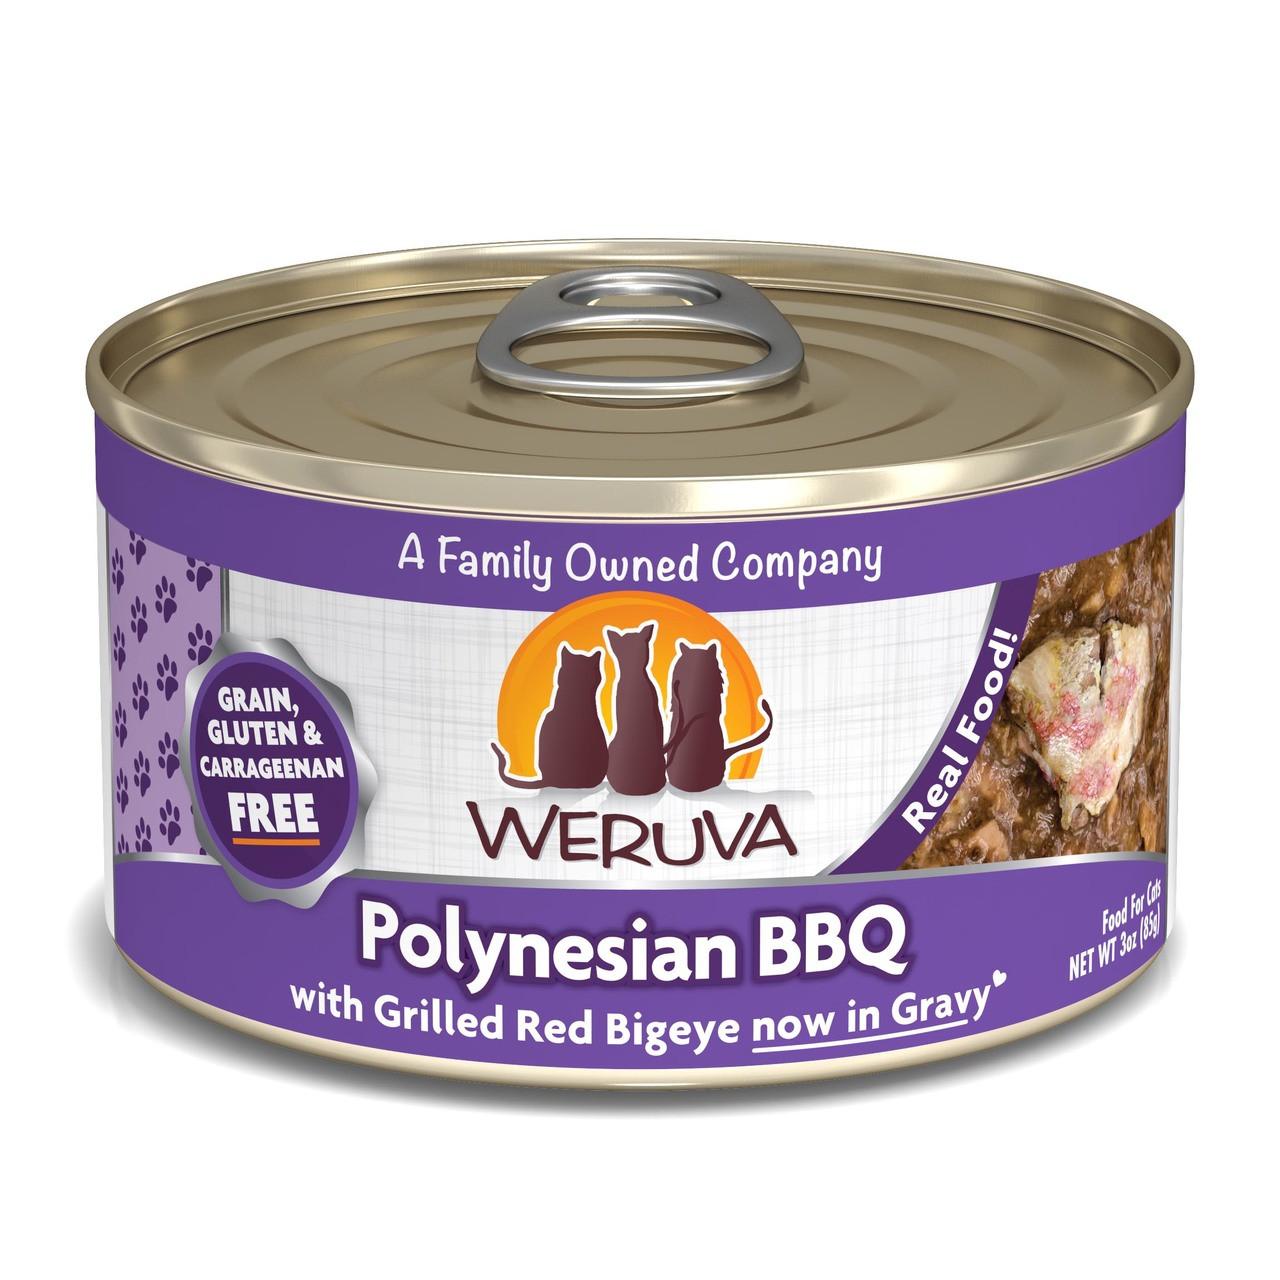 Weruva Polynesian BBQ with Grilled Bigeye Canned Cat Food